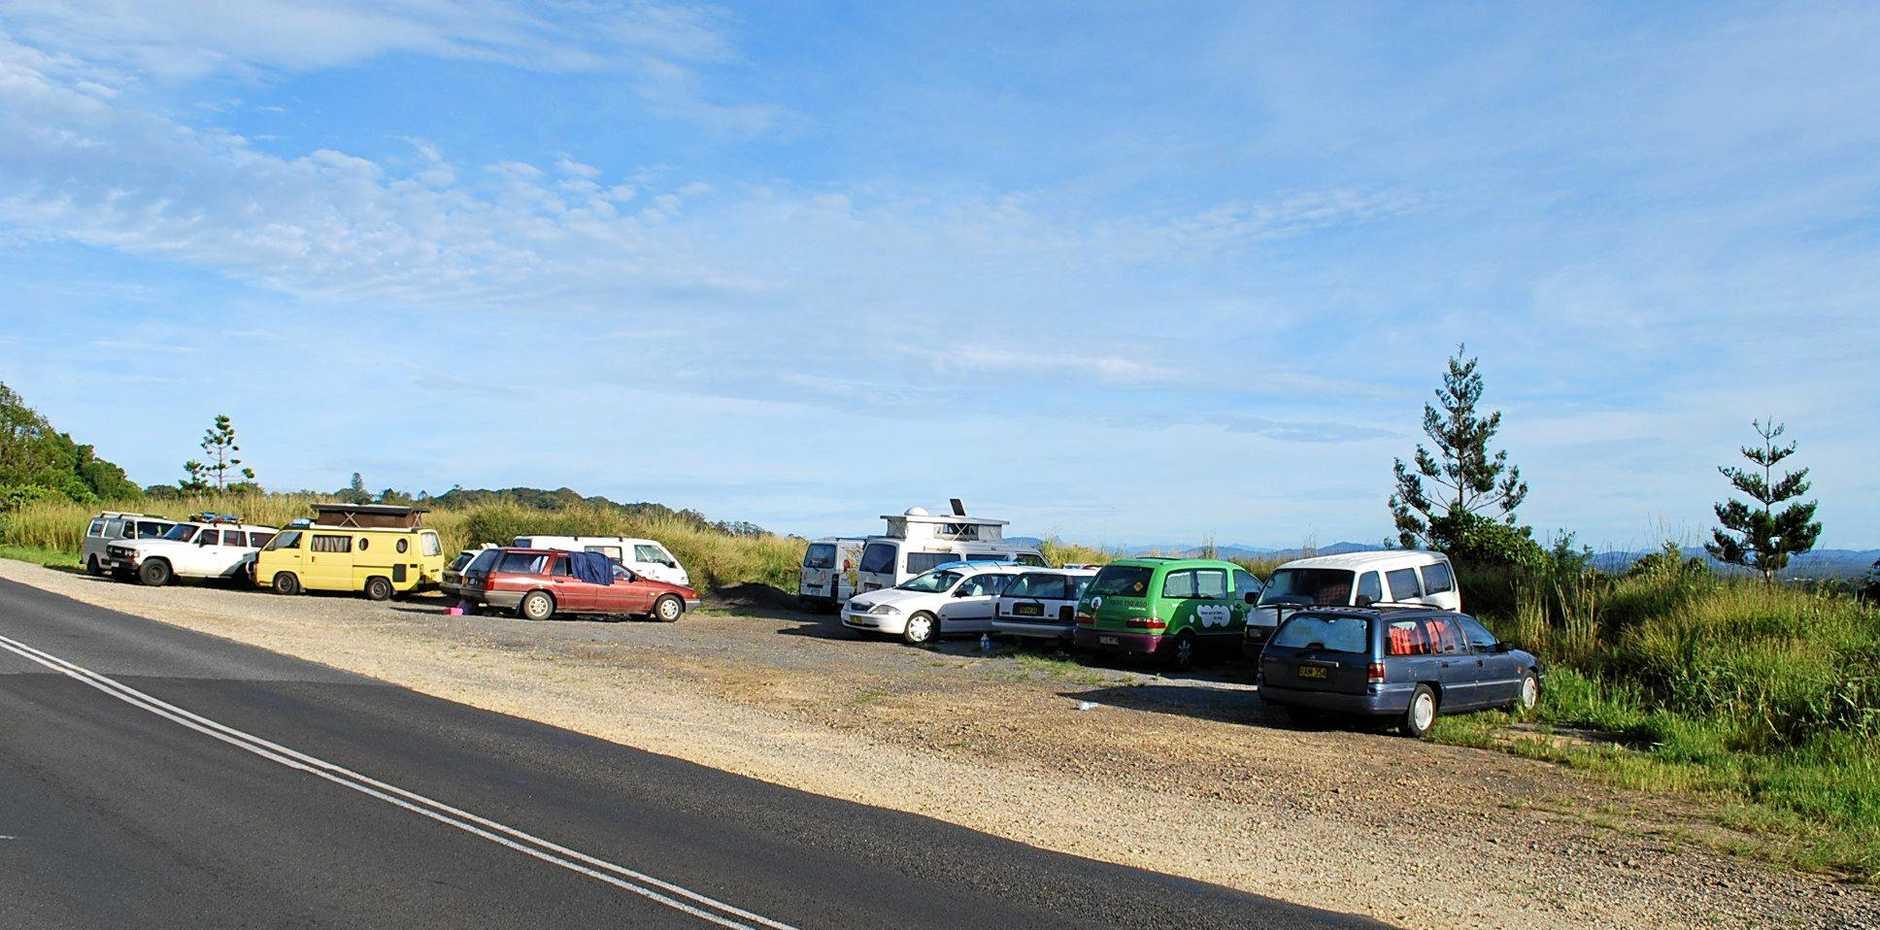 Vanpacking persists in Byron Bay. Photo Christian Morrow / Byron Shire News